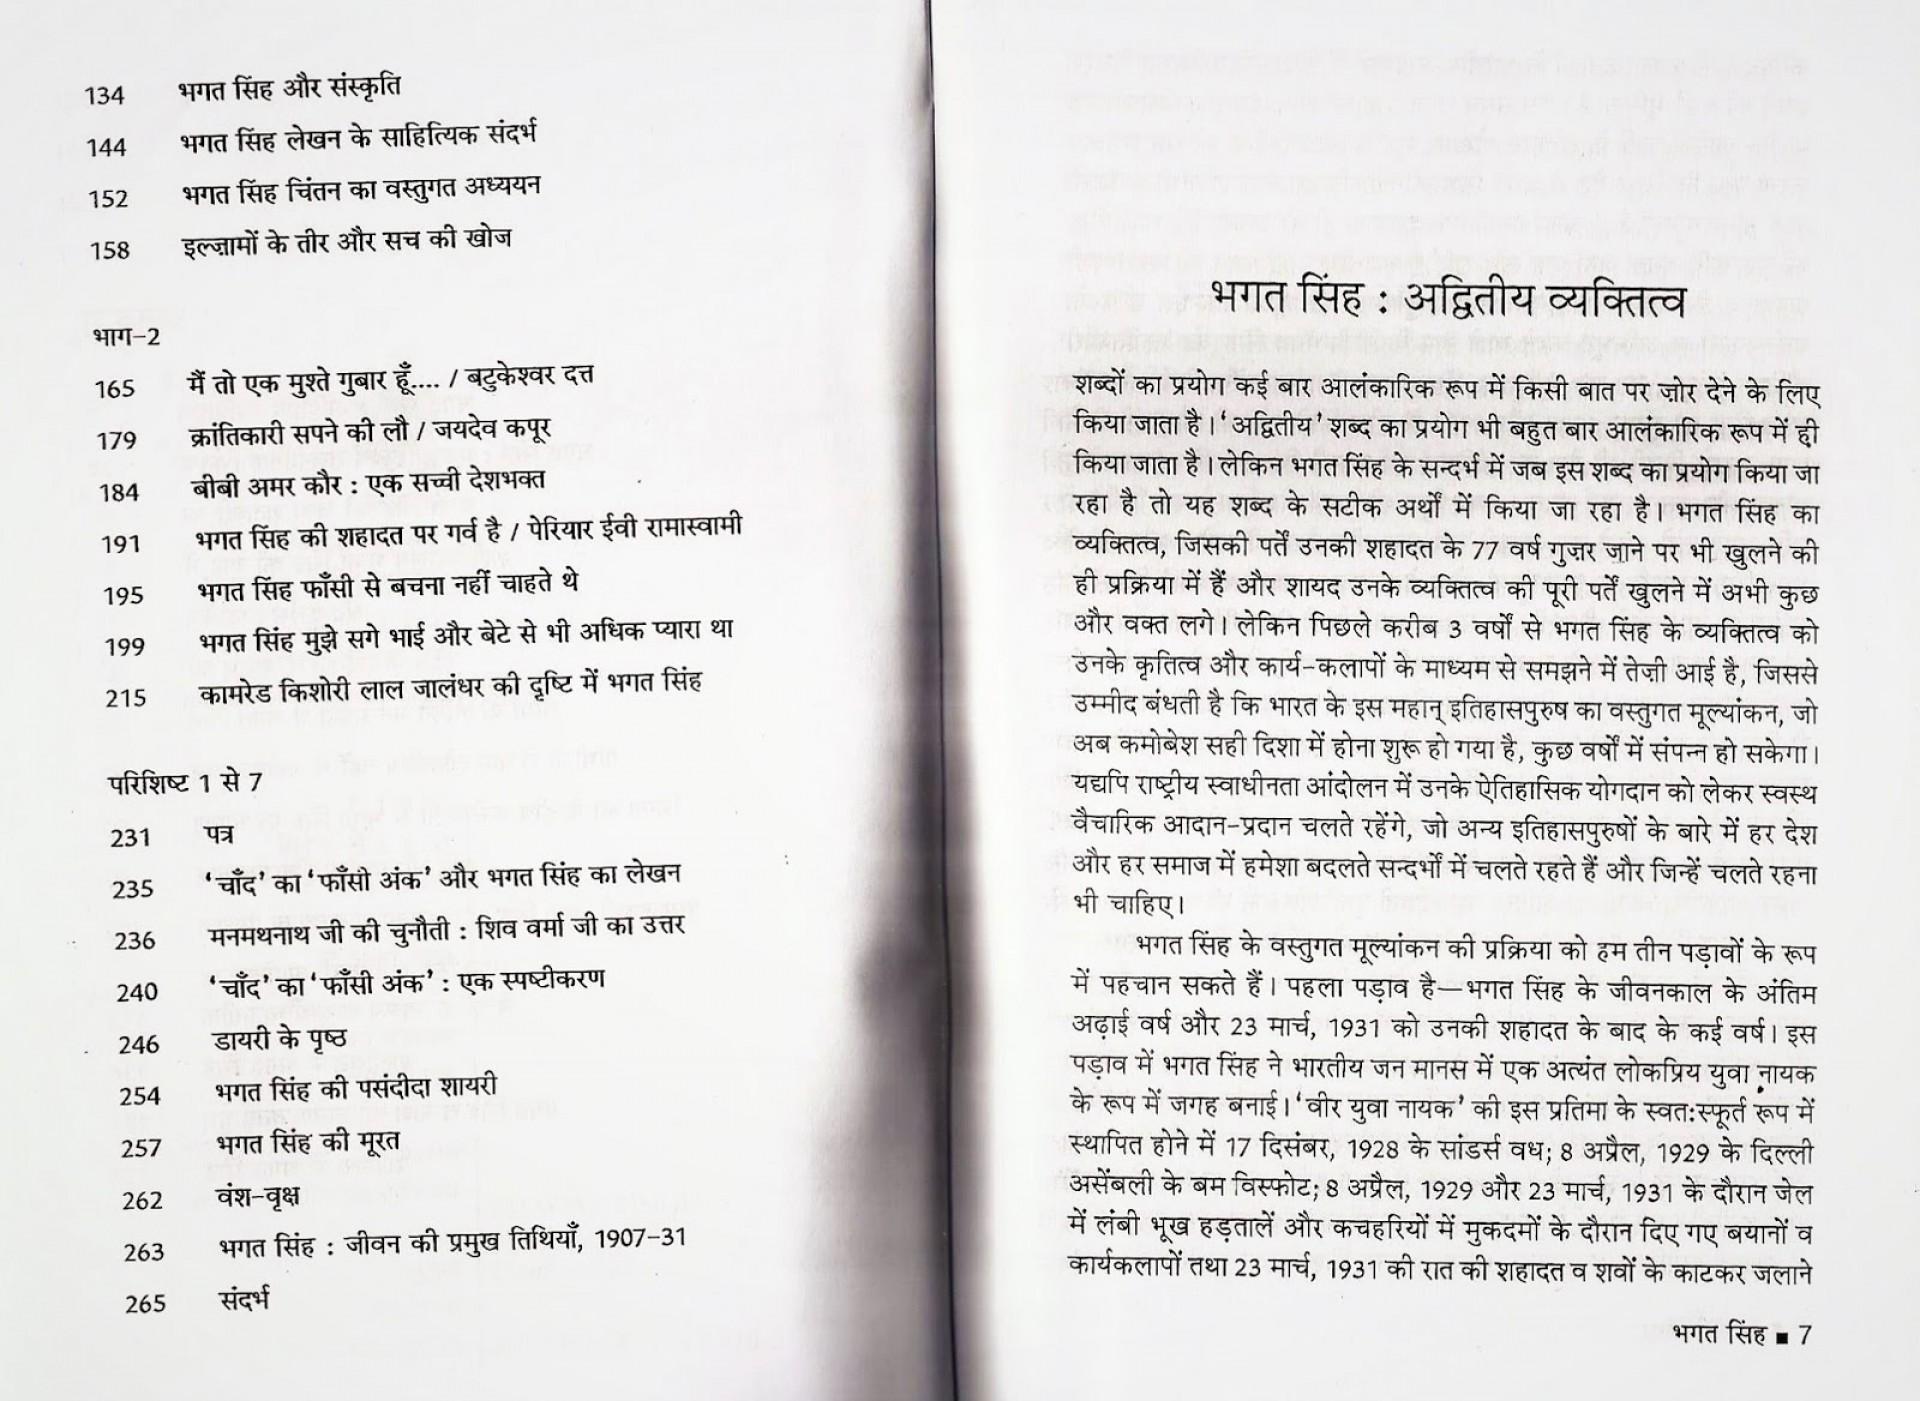 001 Bhagat2bsingh Medha2bpaperback Essay Example On Bhagat Singh In Unique Marathi Short 100 Words 1920